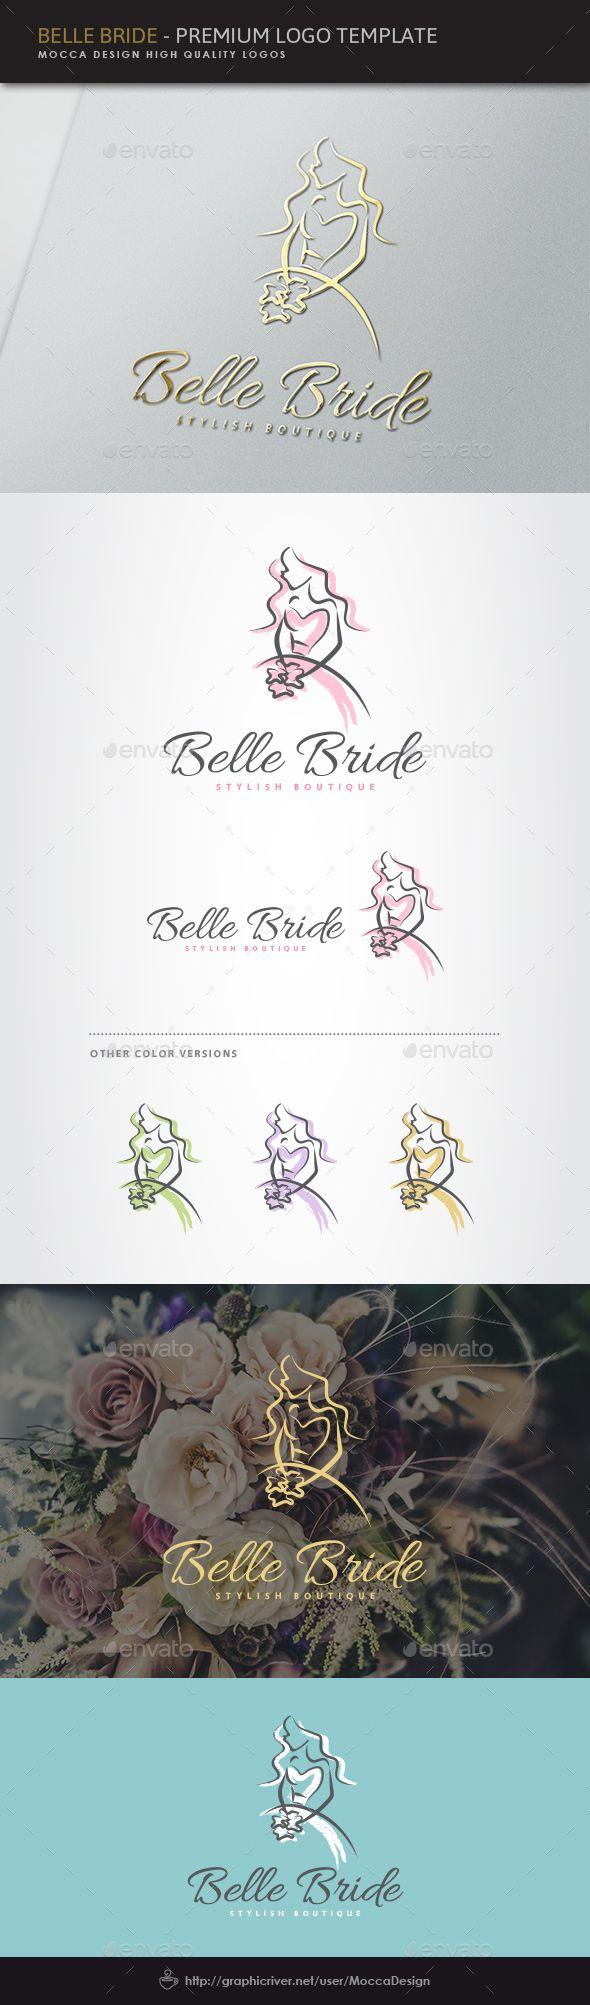 Belle Bride Logo  EPS Template • Download ➝ https://graphicriver.net/item/belle-bride-logo/15982119?ref=pxcr